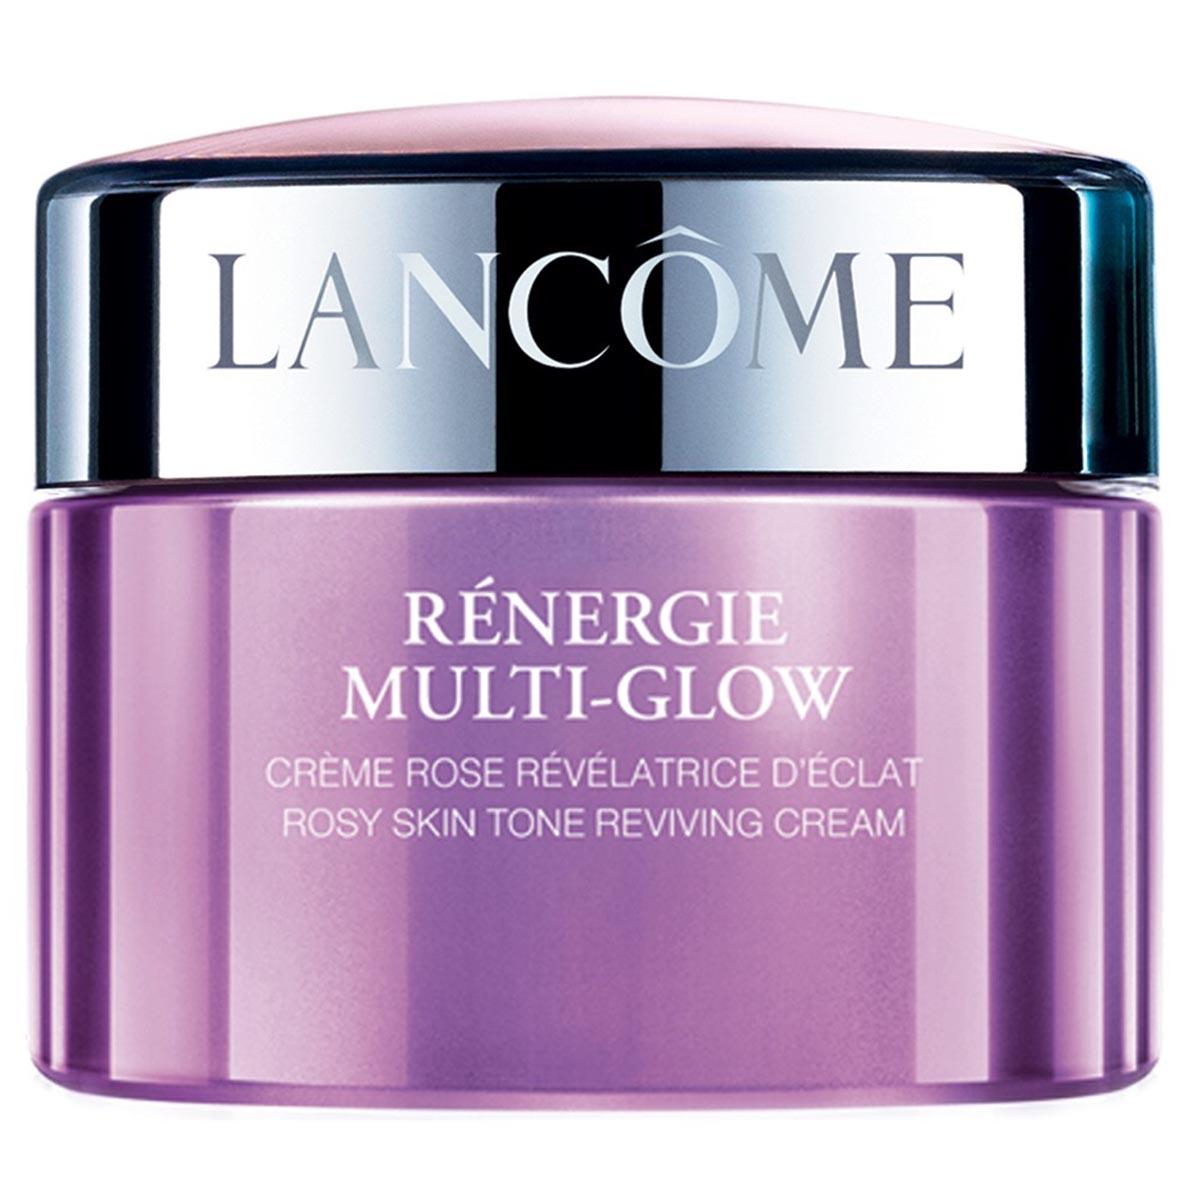 Lancome renergie multi glow red cream 50ml